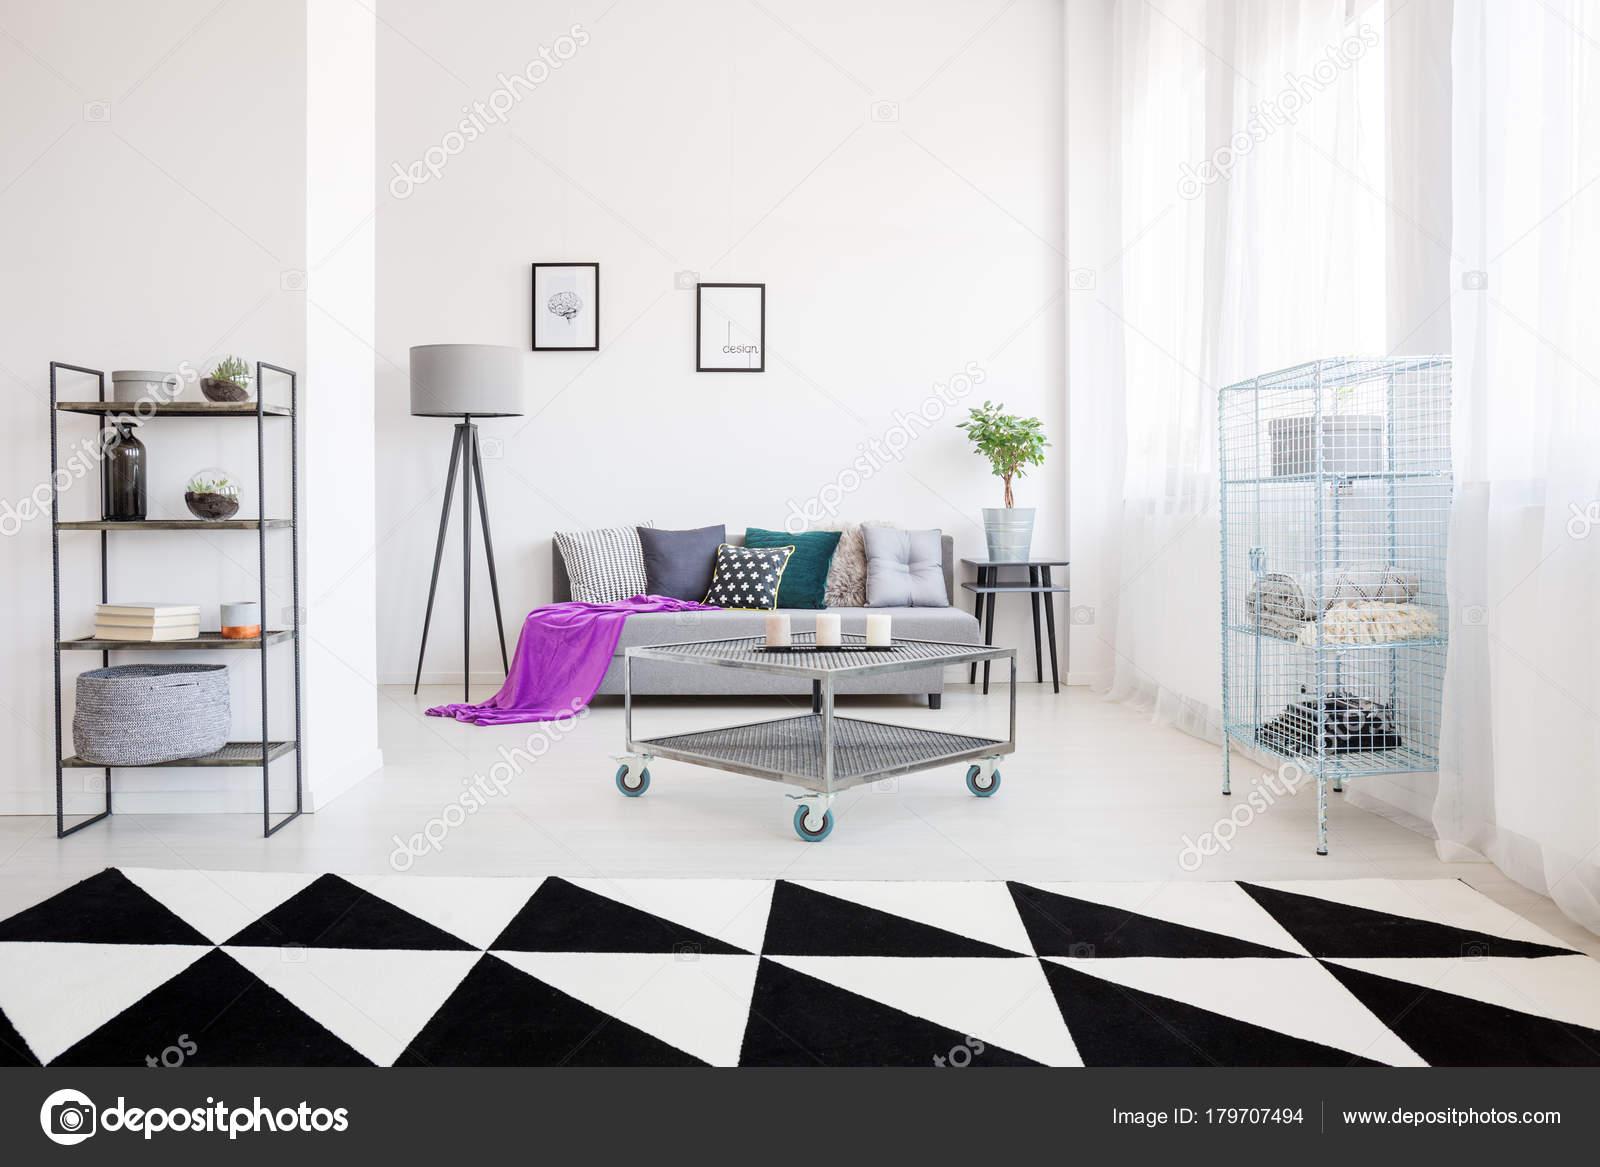 Zwart Wit Appartement : Zwart wit industriële appartement u2014 stockfoto © photographee.eu